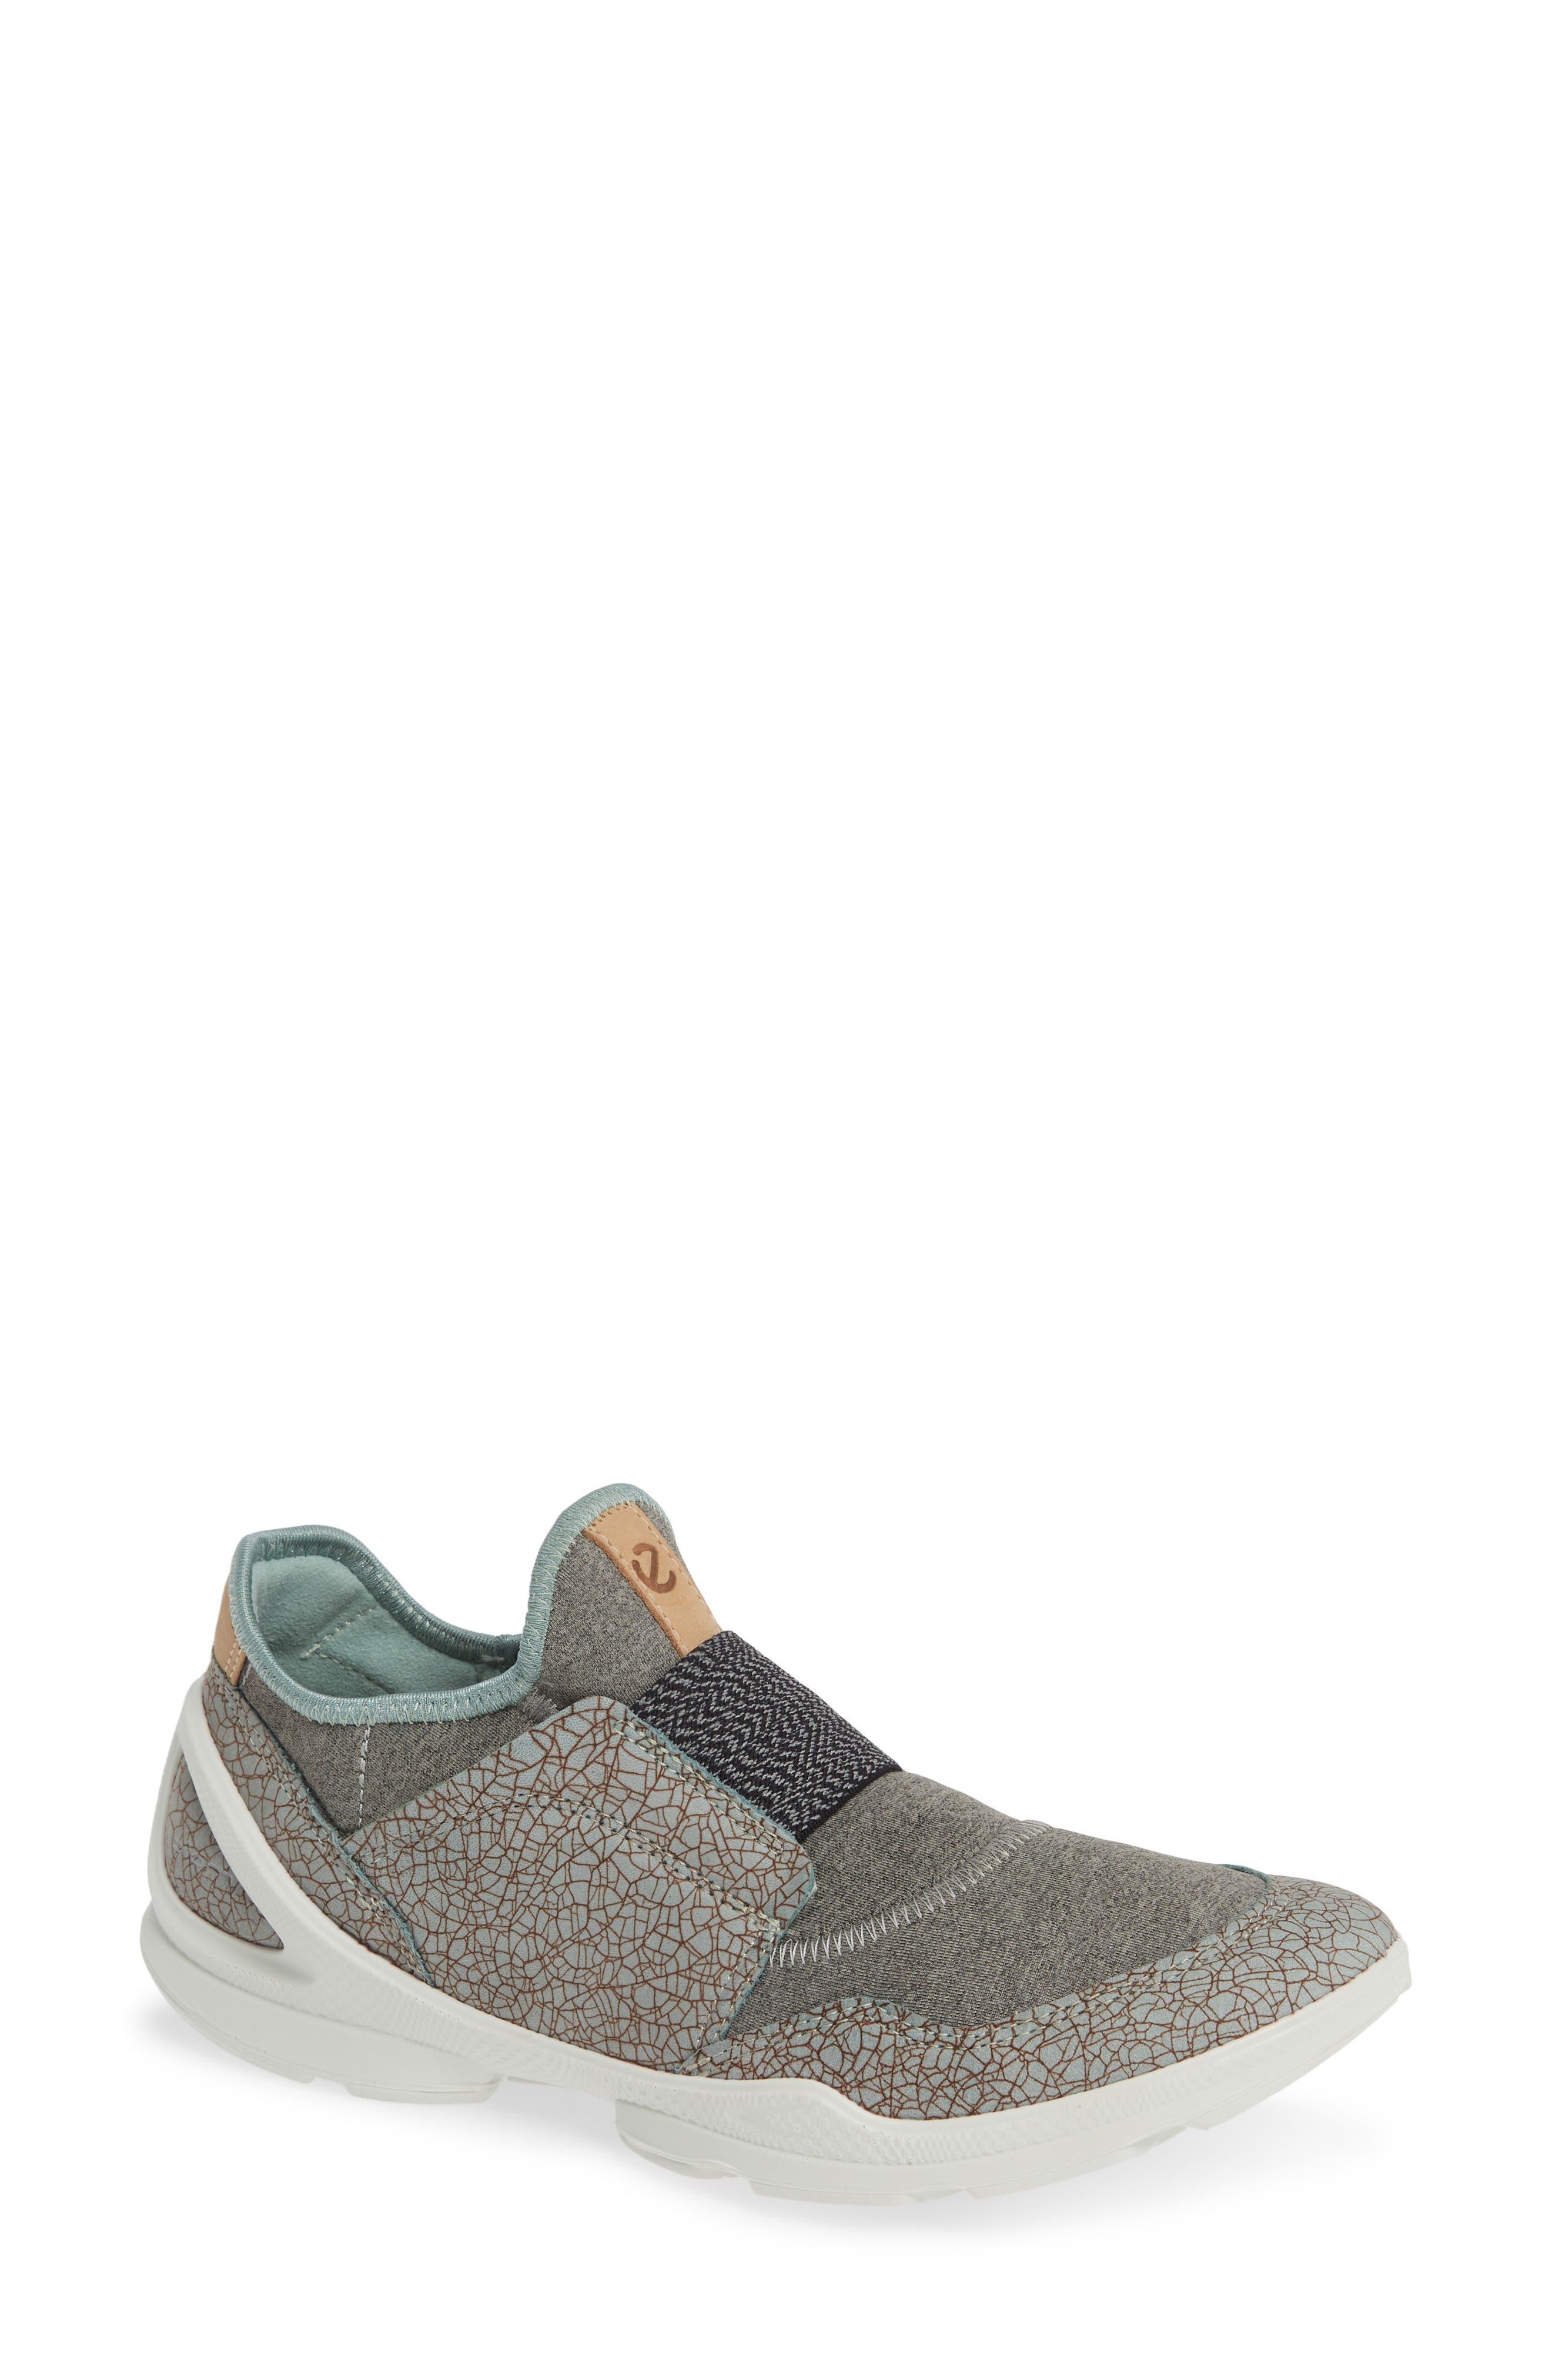 Ecco Biom Street Slip-On Sneaker, Grey